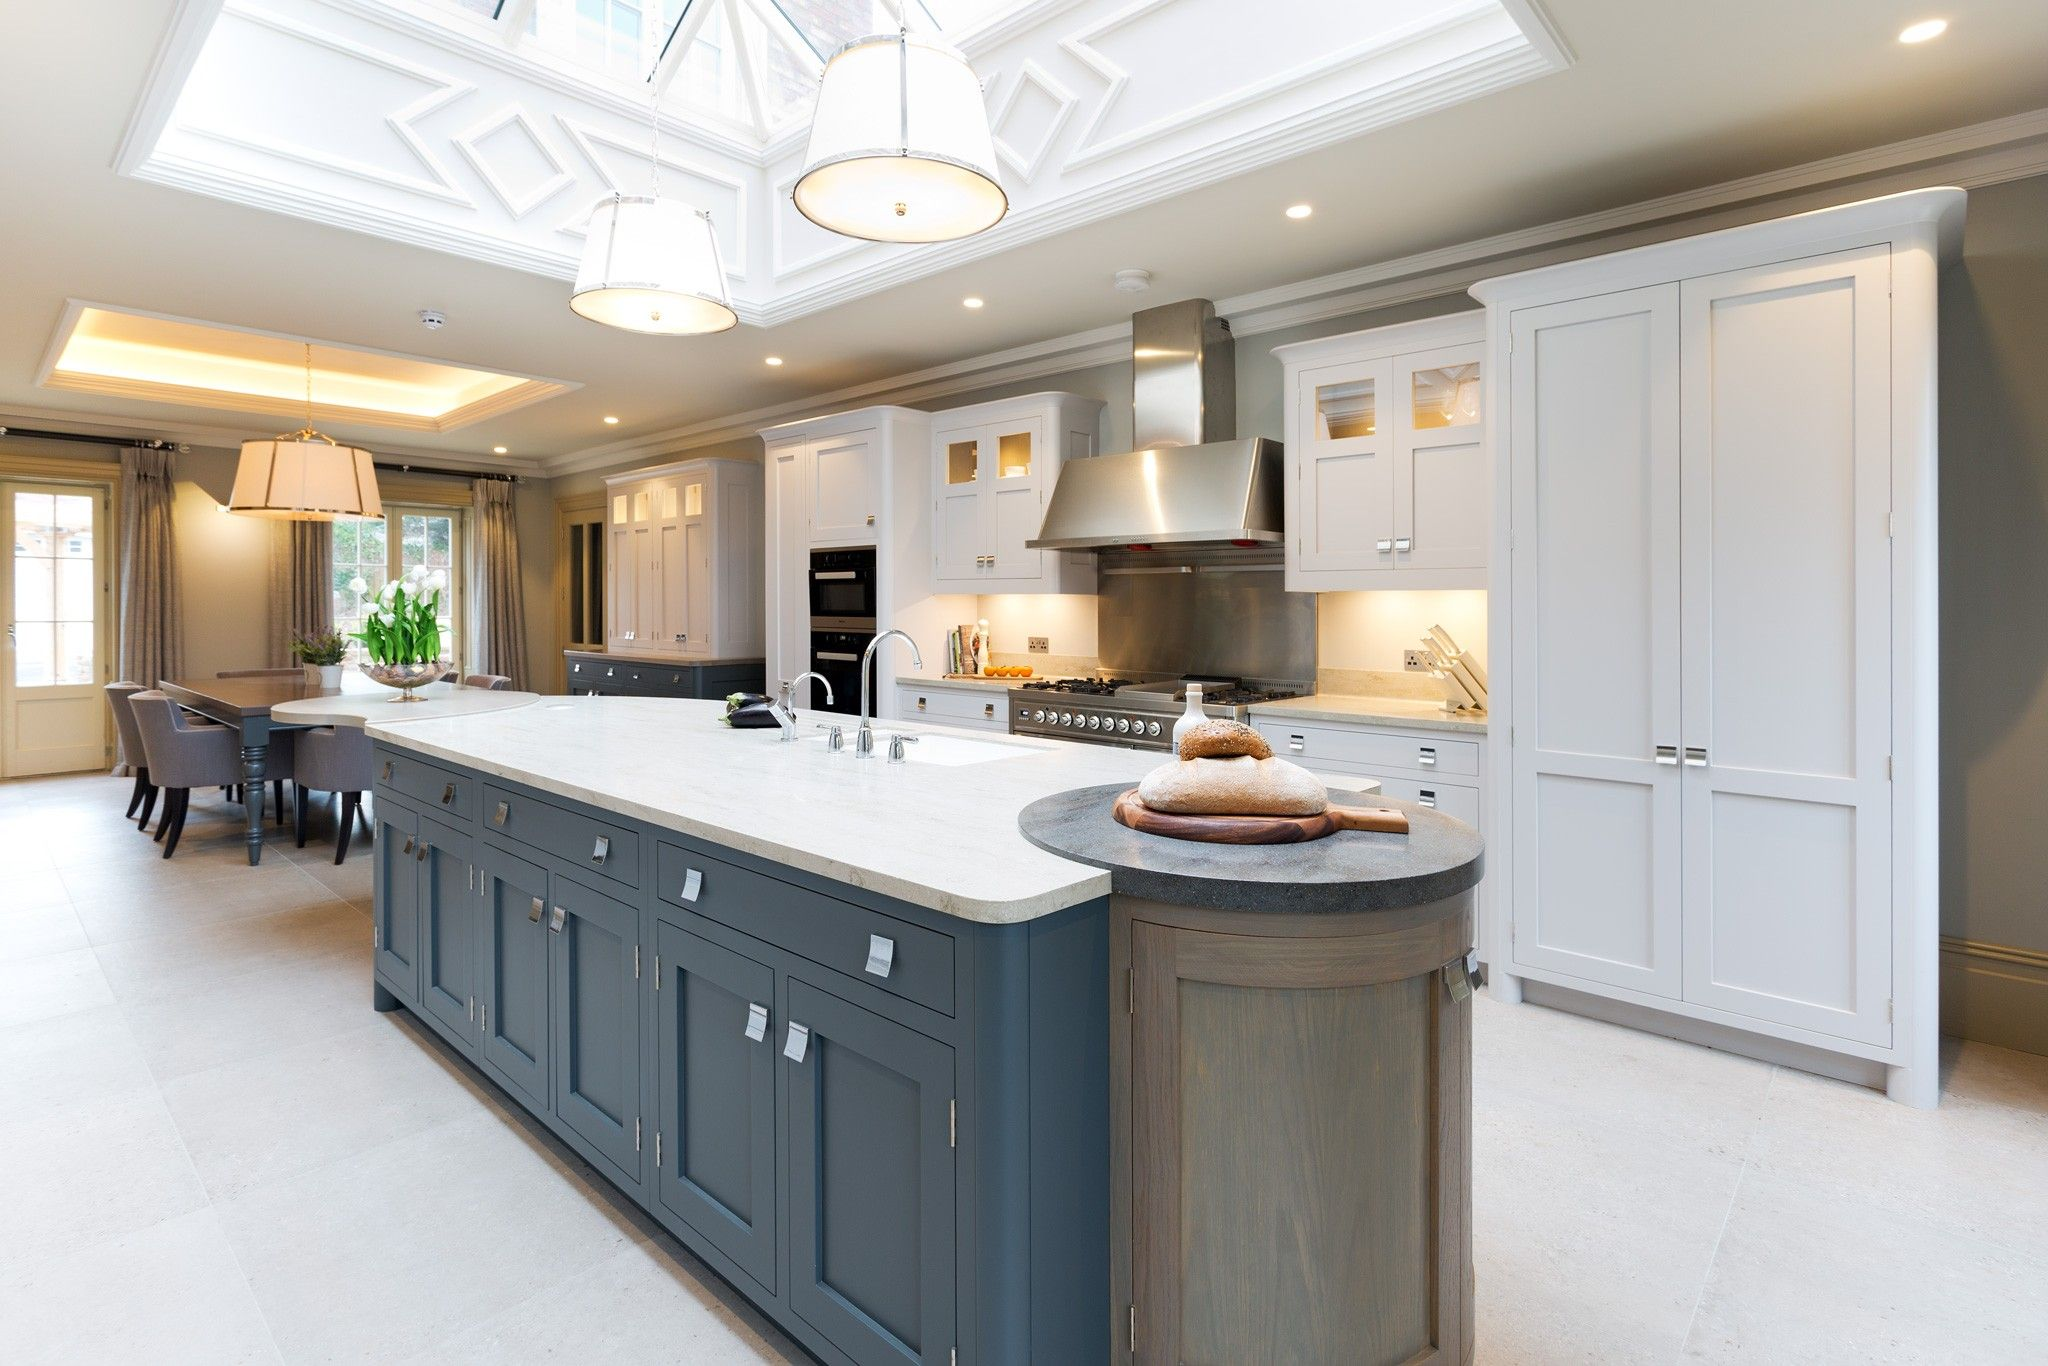 Kitchen Design Victorian House Luxury Kitchens Ideas Ireland